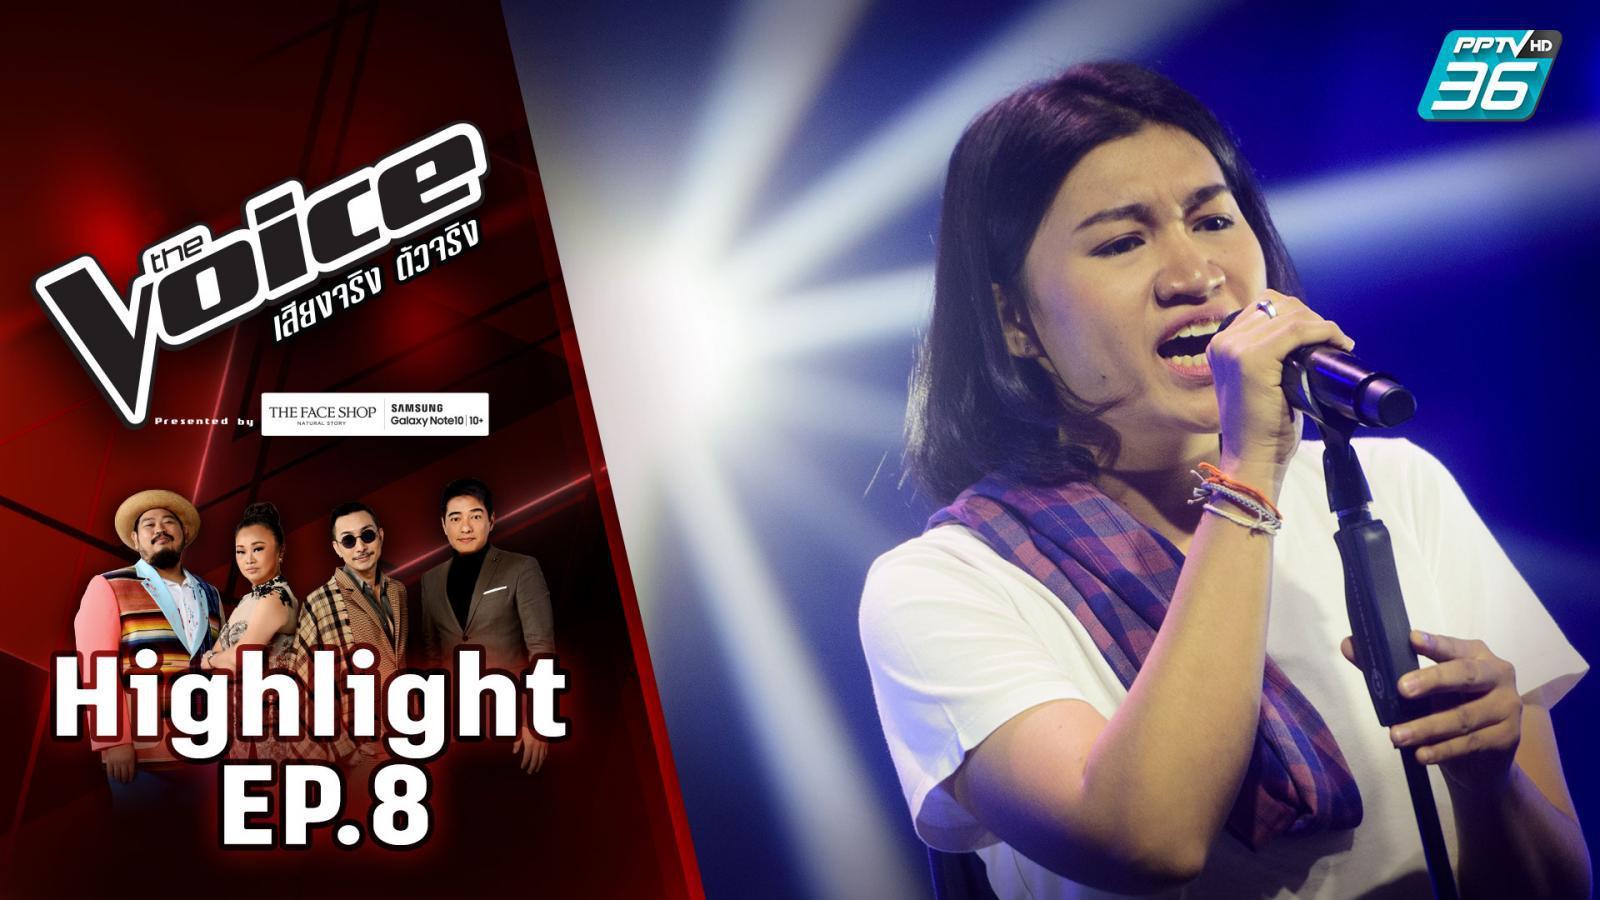 The Voice 2019 | 'ปังปอนด์' สาวบุรีรัมย์ กับเพลง 'Hello Mama' ที่ทำโค้ชทึ้ง  | Highlight EP8